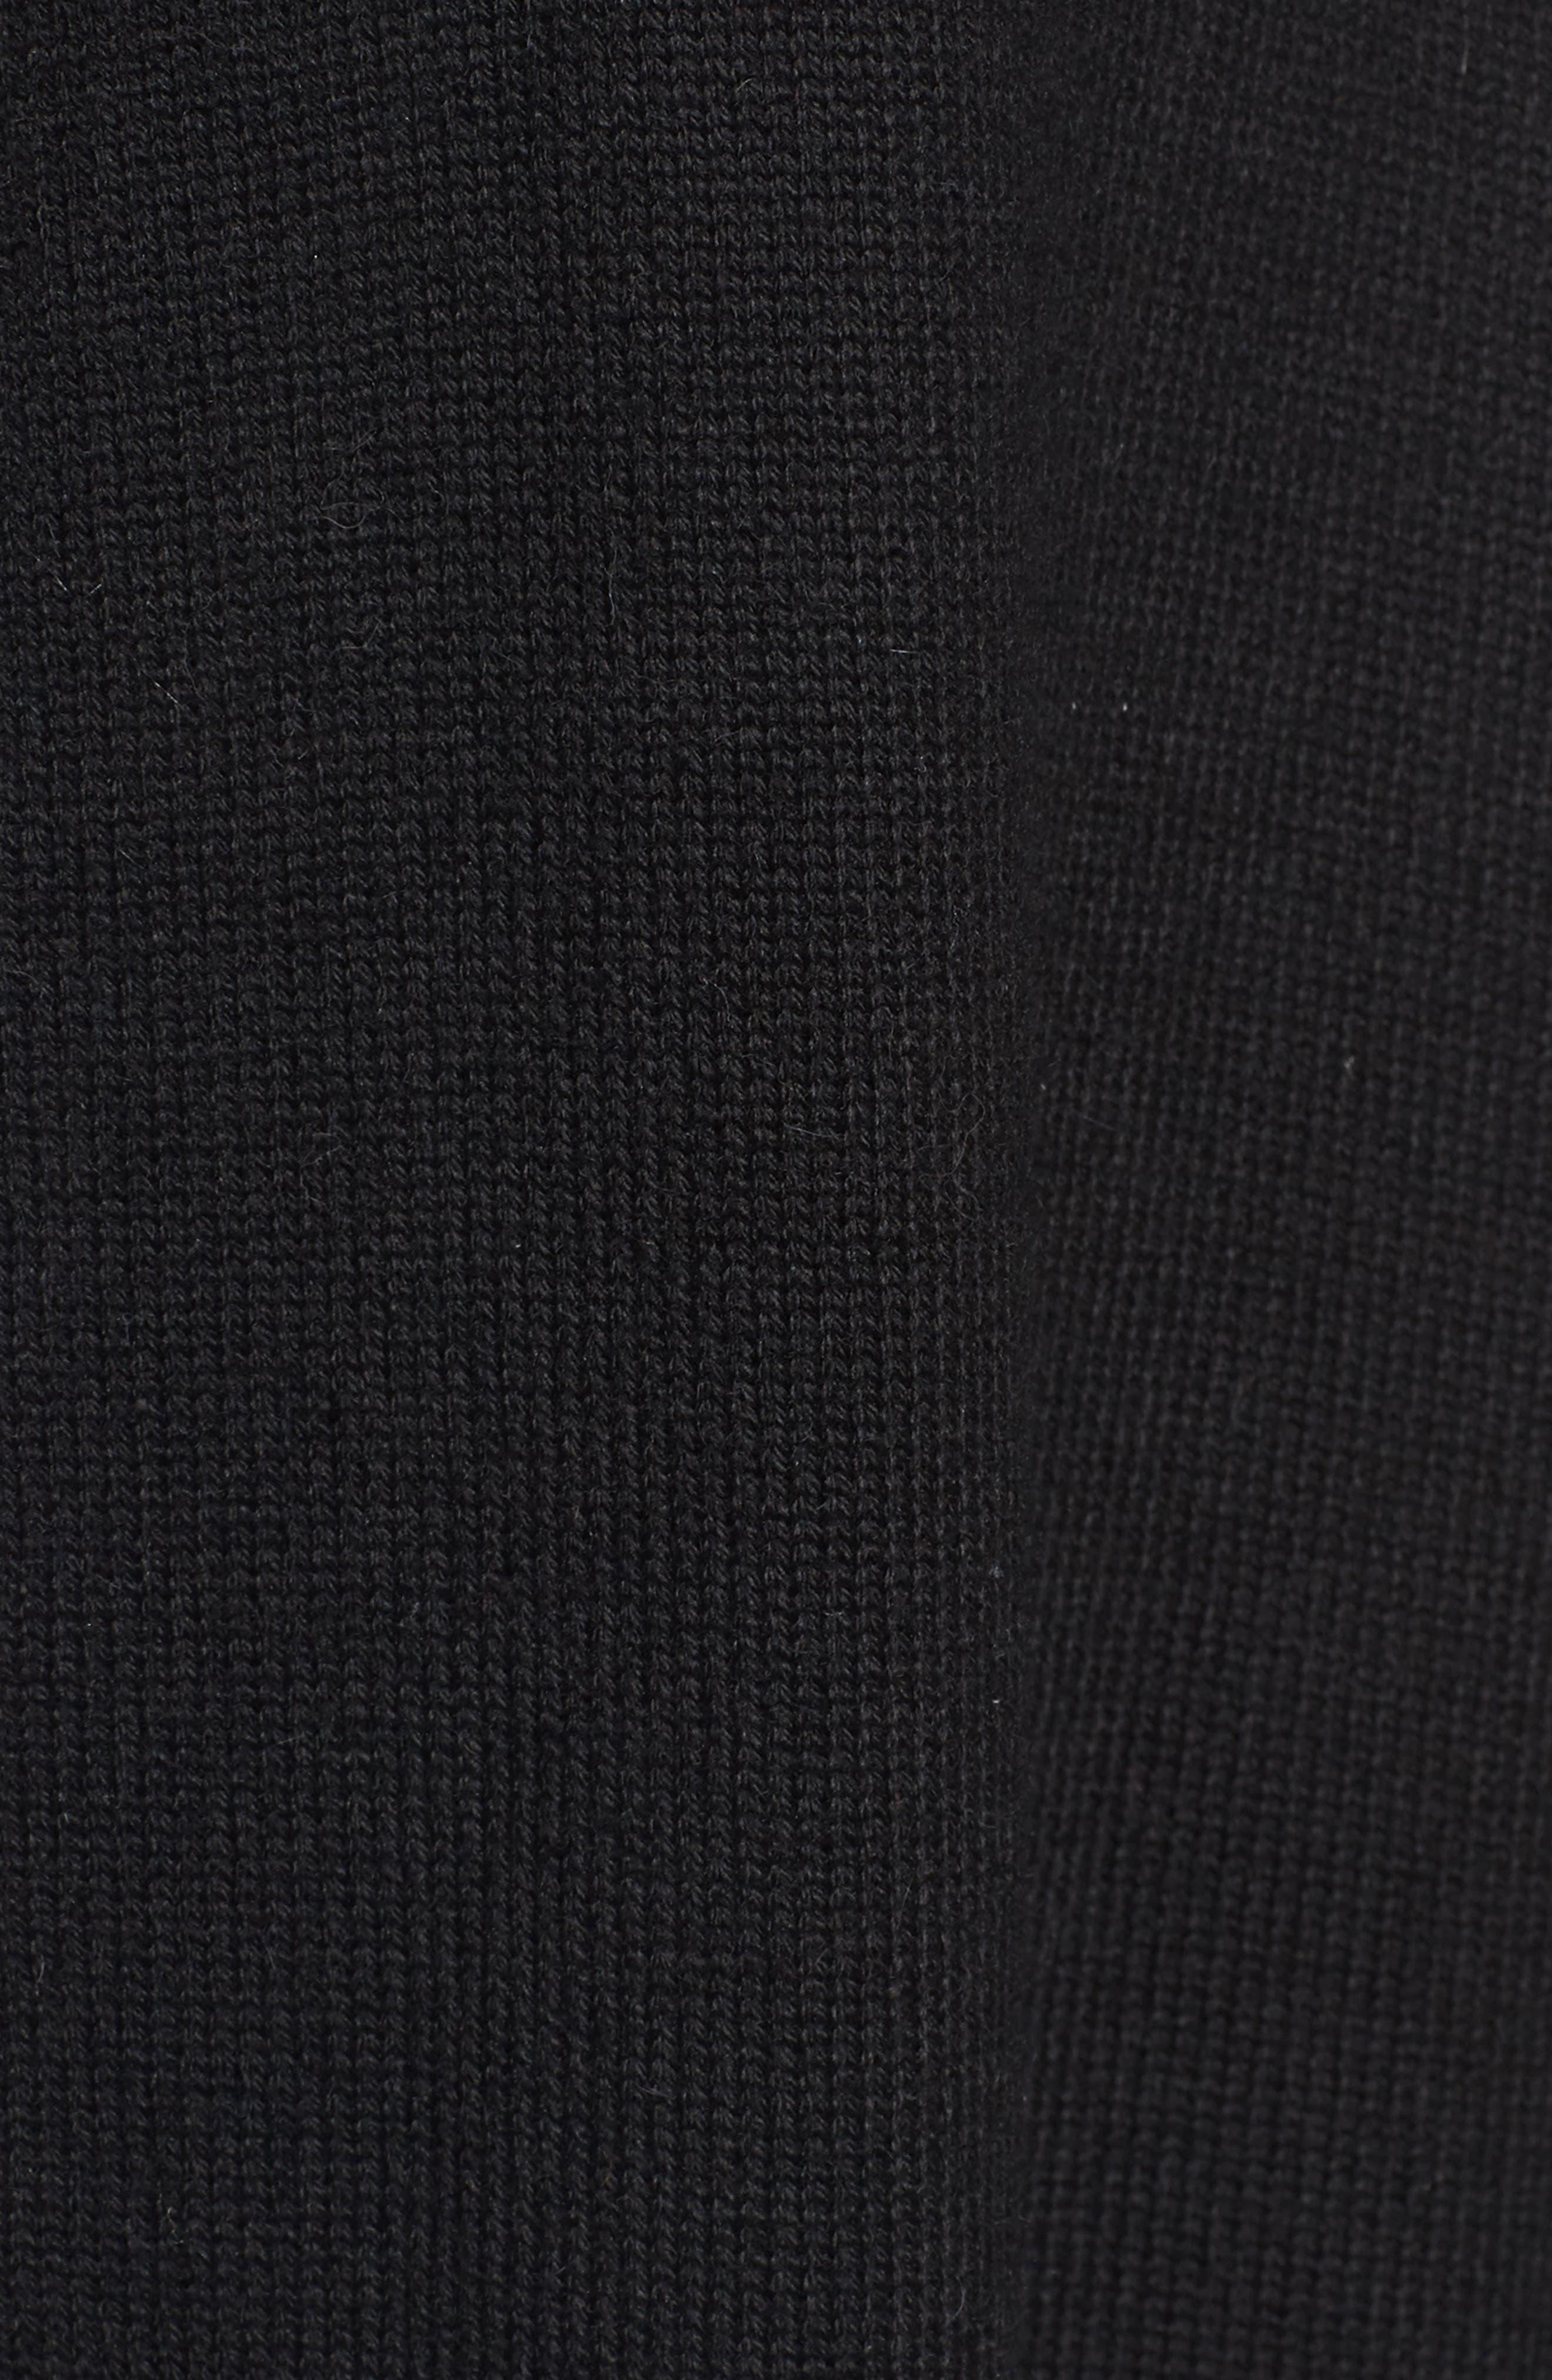 Knit Poncho with Faux Fur Trim,                             Alternate thumbnail 6, color,                             001